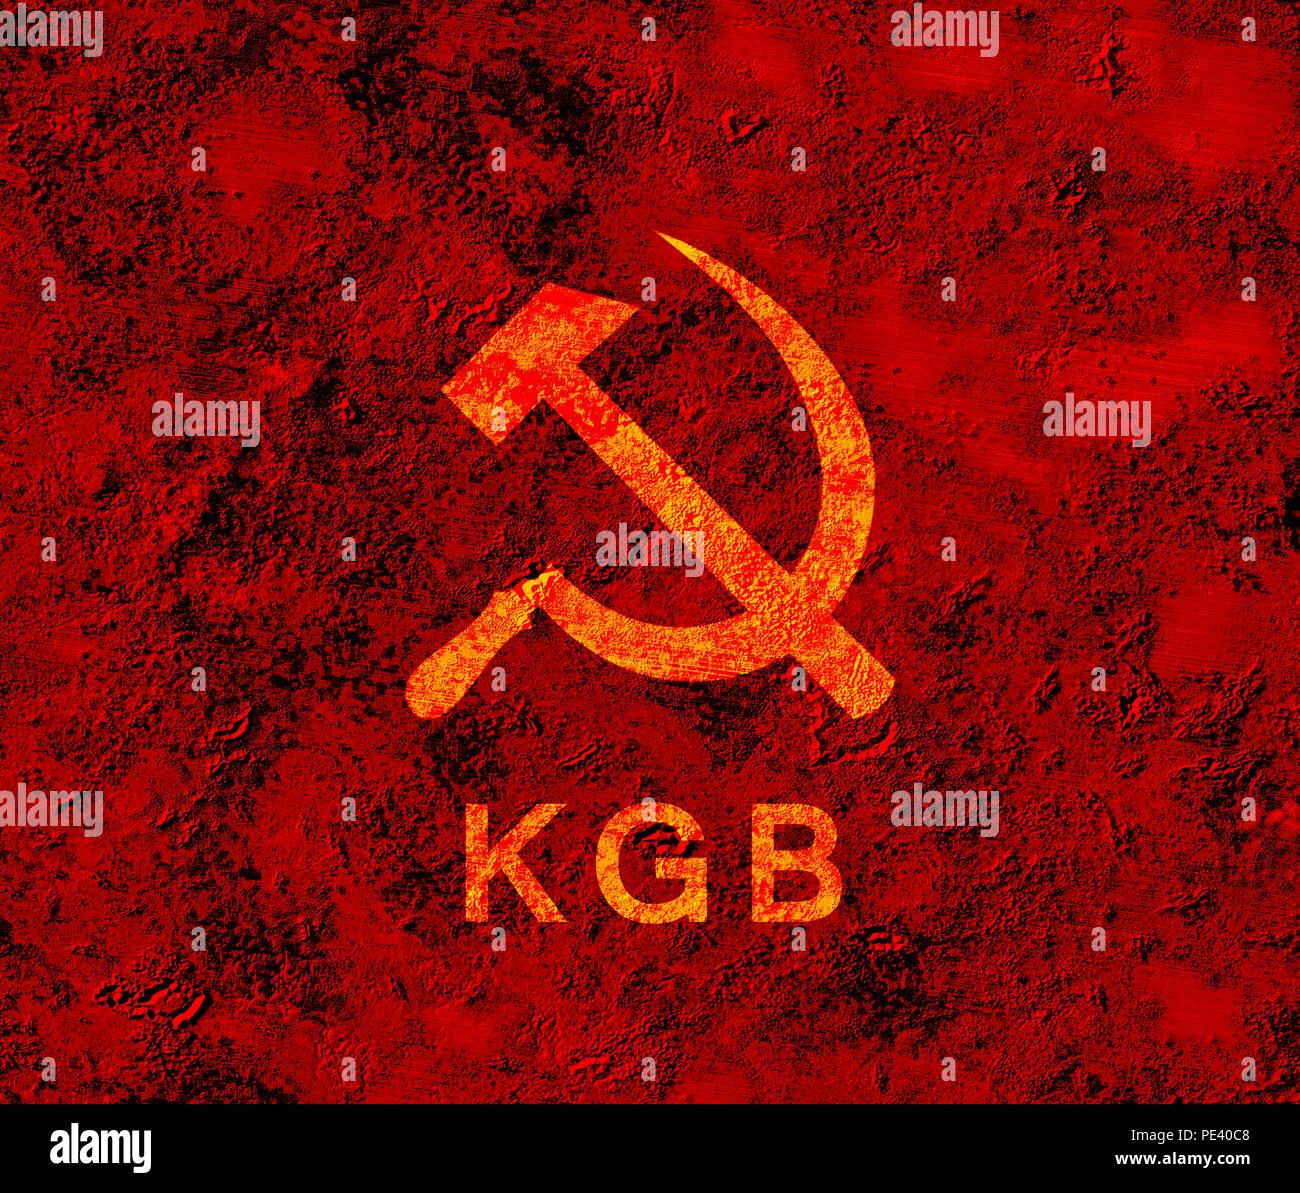 USSR symbol KGB - Stock Image